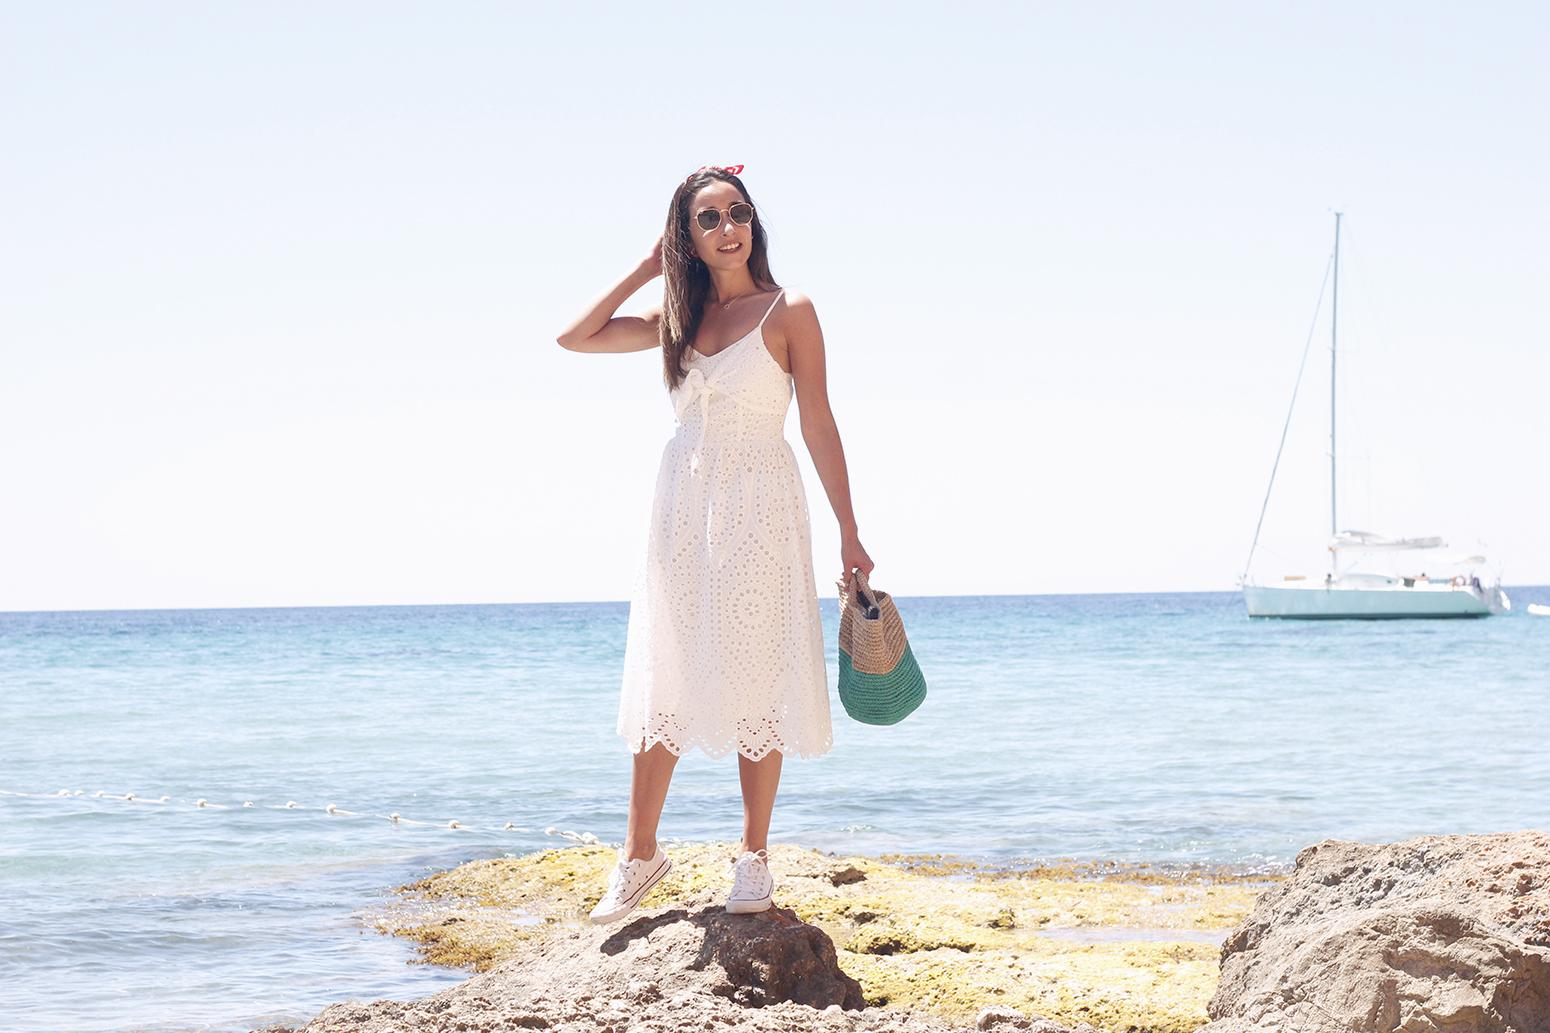 white summer dress white converse rayban sunglasses 2019 street style outfit vacation ibiza11